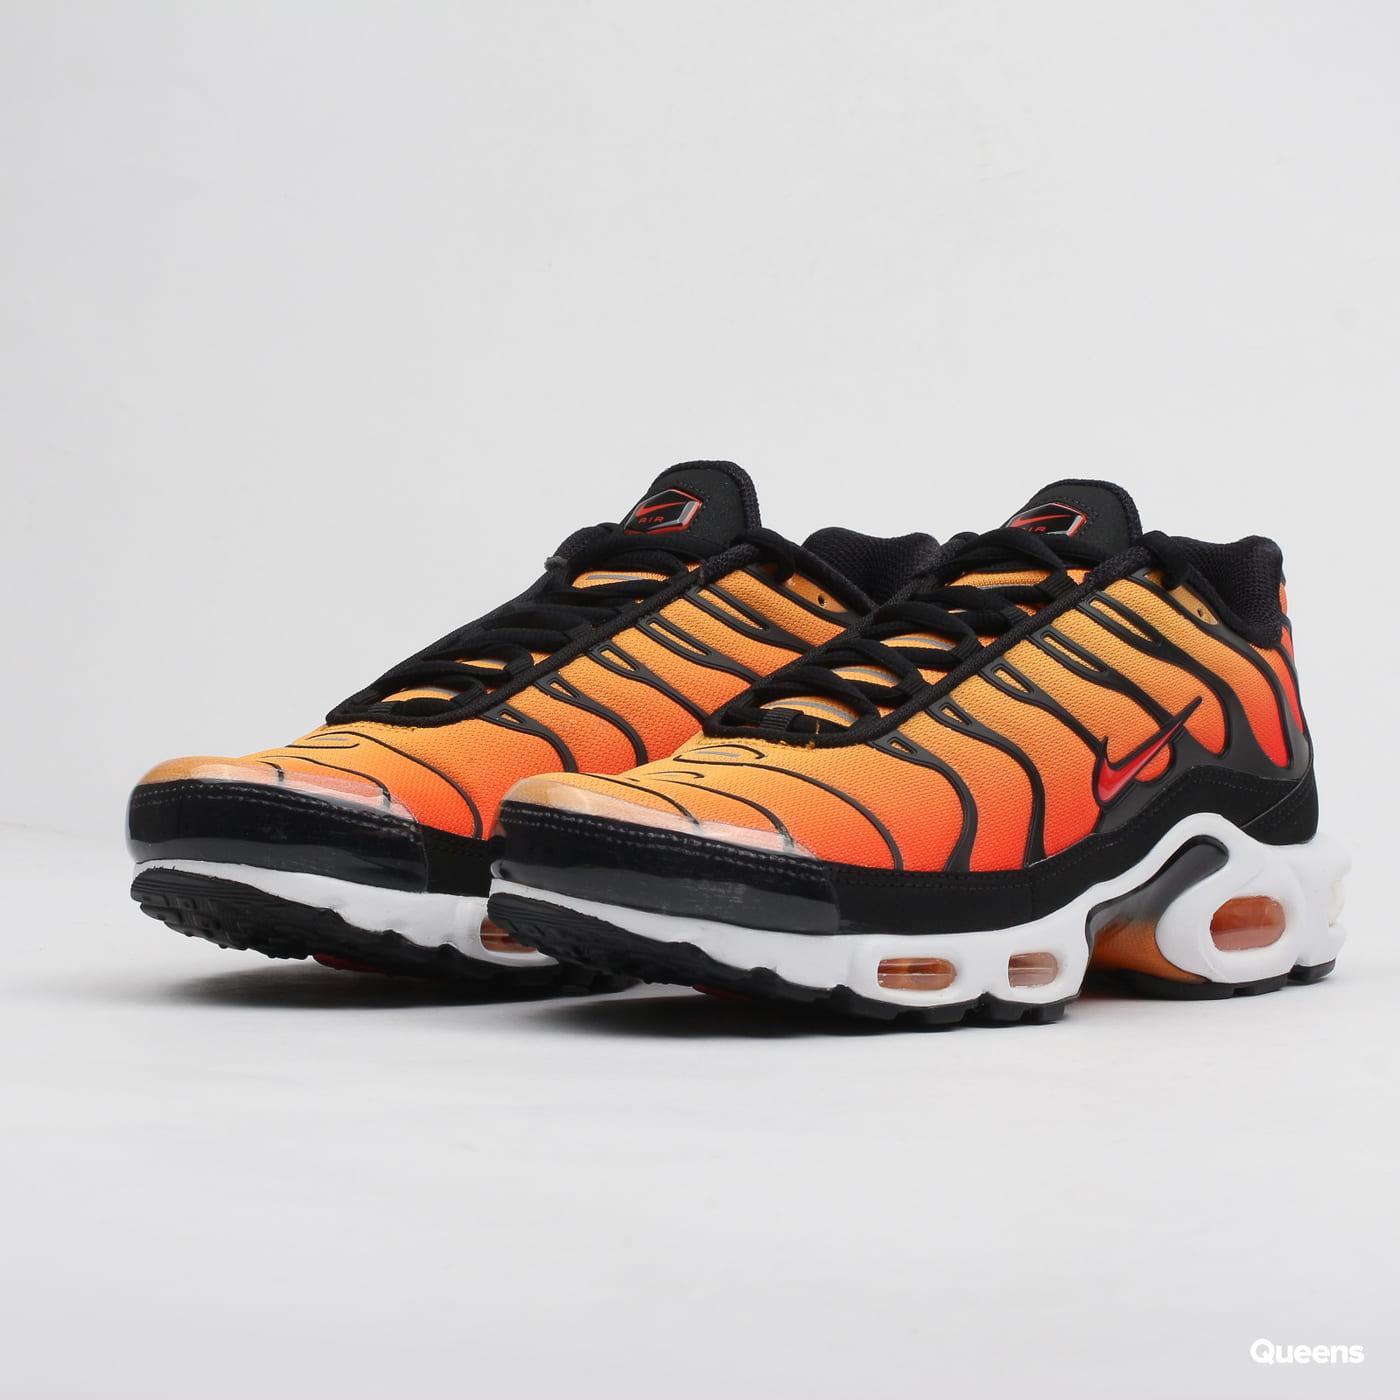 online retailer eb914 db935 Nike Air Max Plus OG black / pimento - bright ceramic